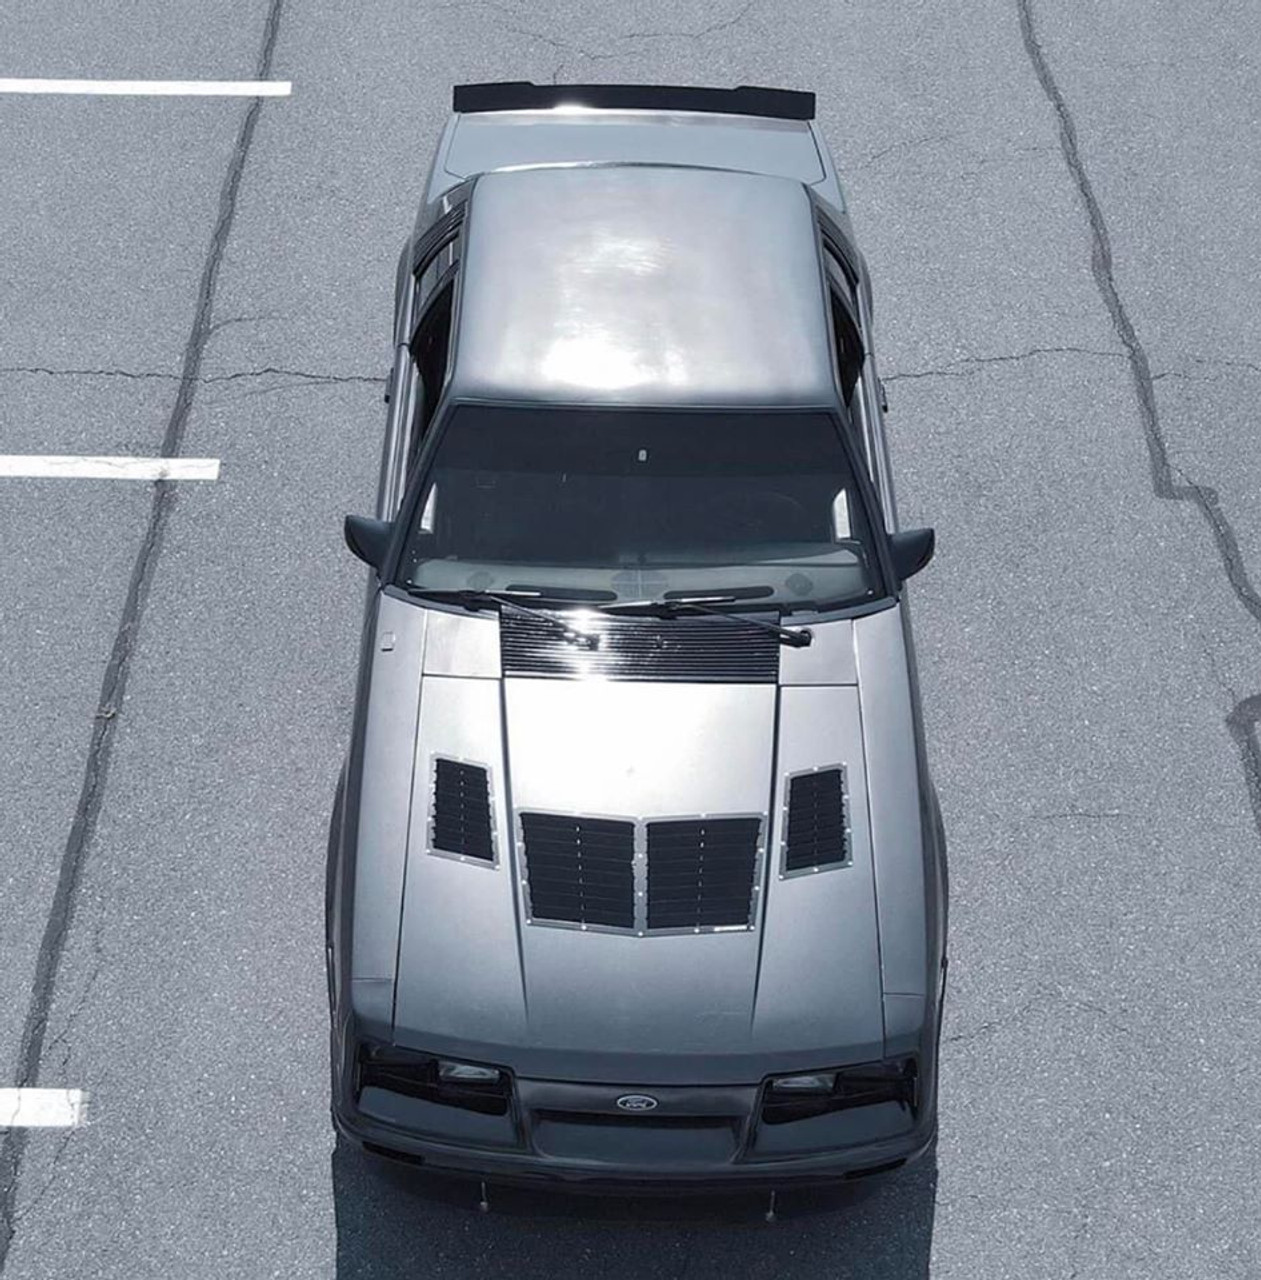 79-93 Mustang Coupe/Convertible Center Cut Ducktail Spoiler